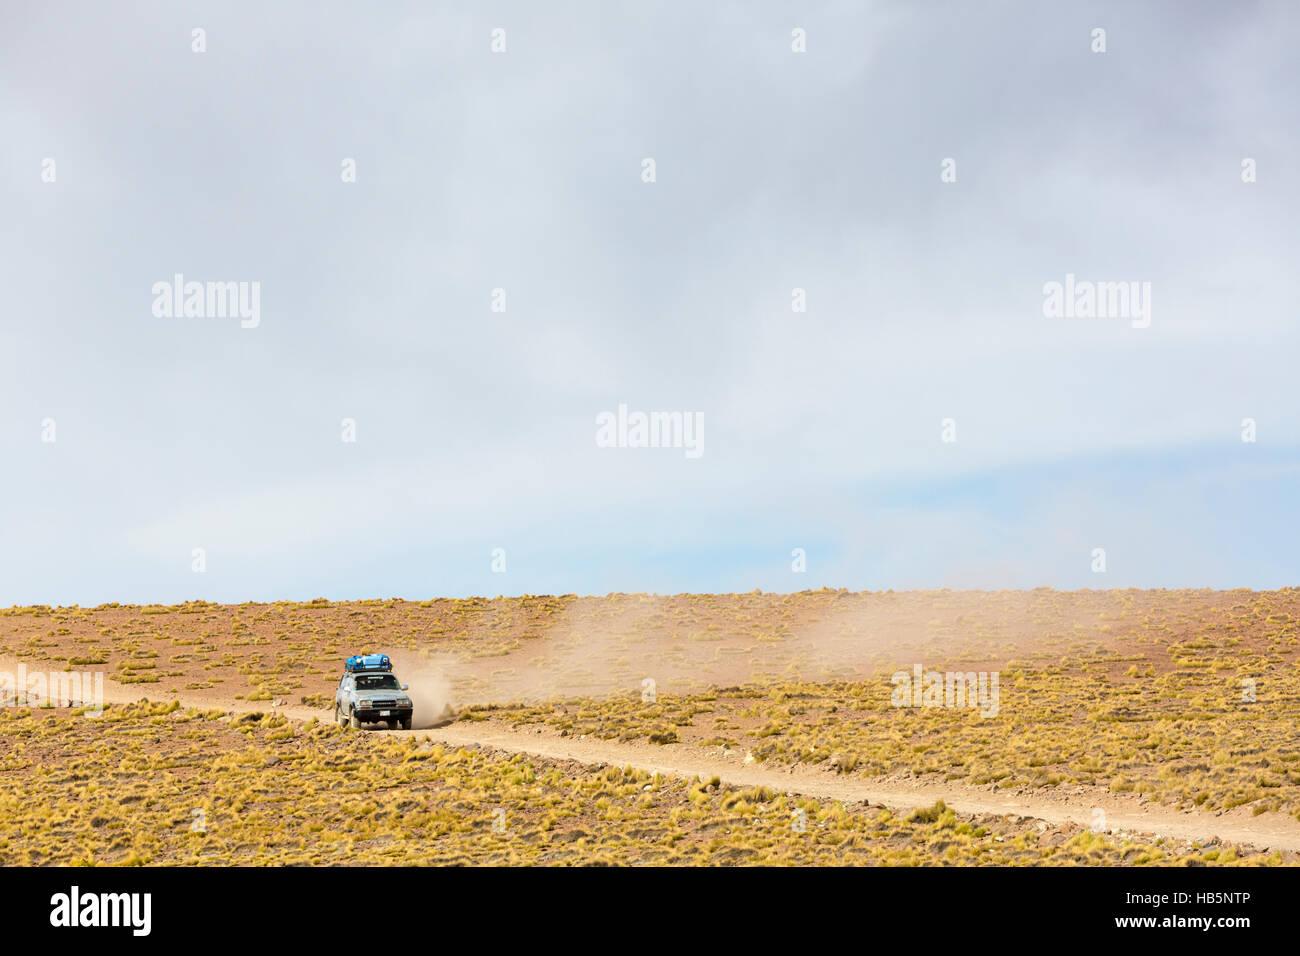 Off-Road-Fahrzeug fährt in der Atacama-Wüste, Bolivien Stockbild